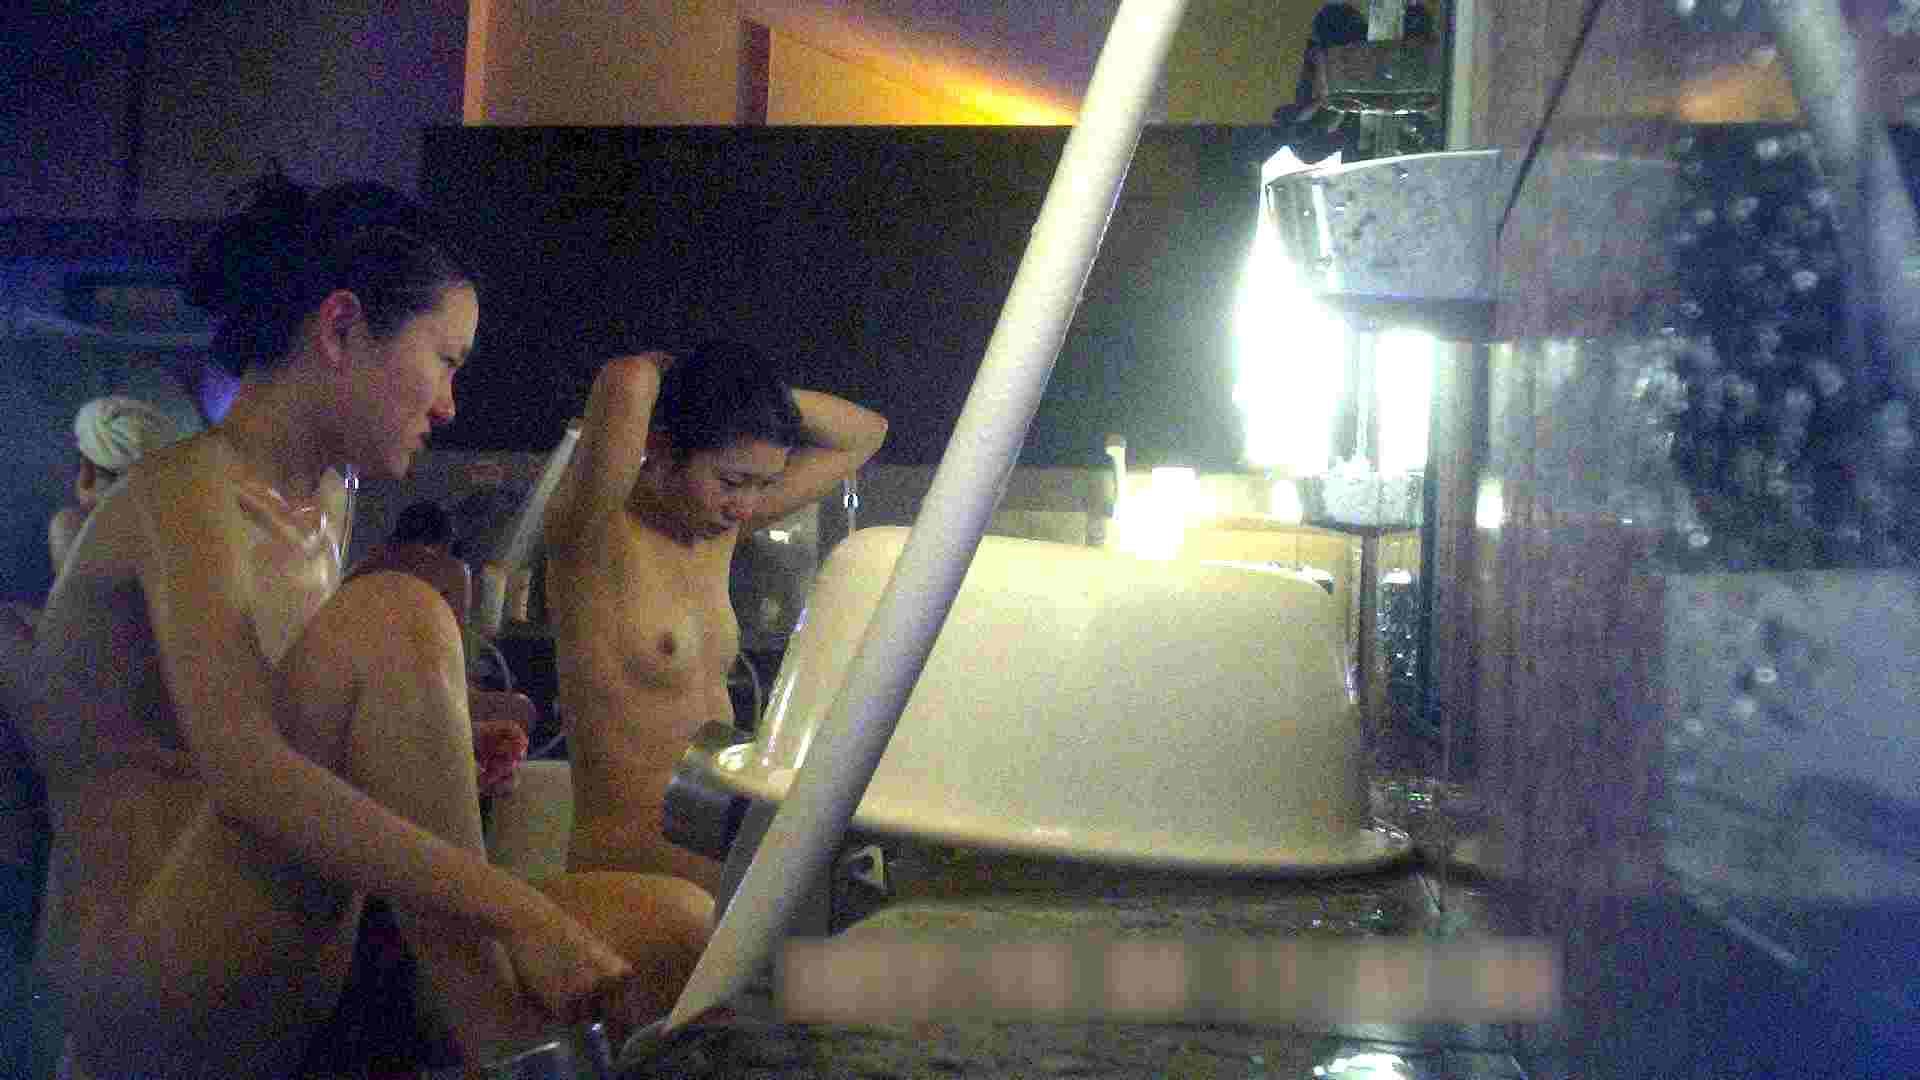 TG.06 【二等兵】スレンダー奥様の可愛い微乳 潜入 | 貧乳  29画像 19